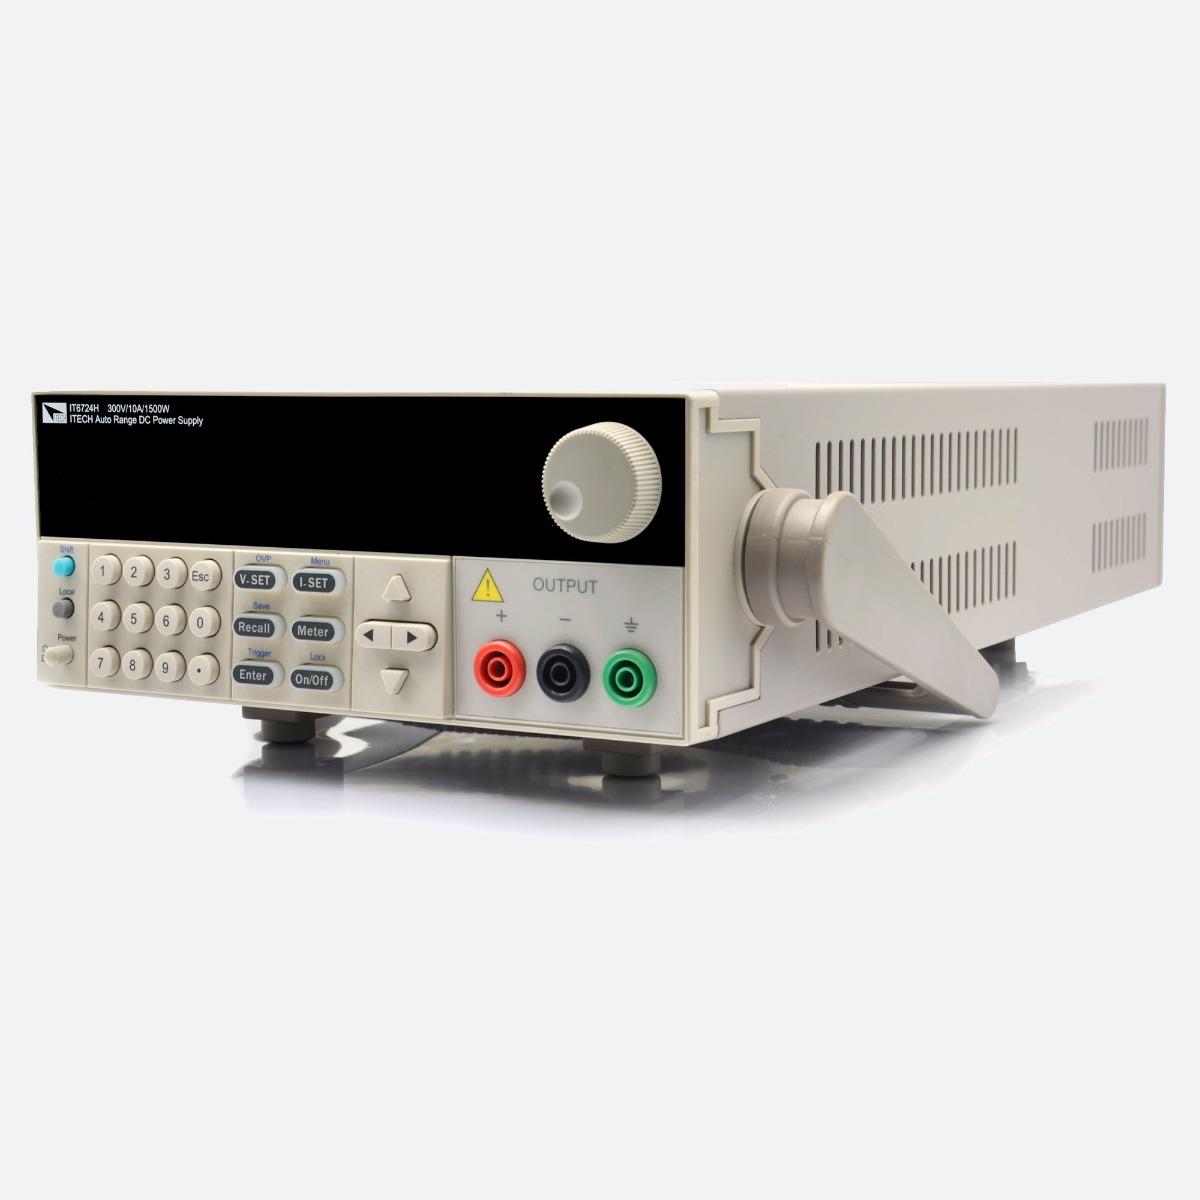 ITECH IT6700H series CControls